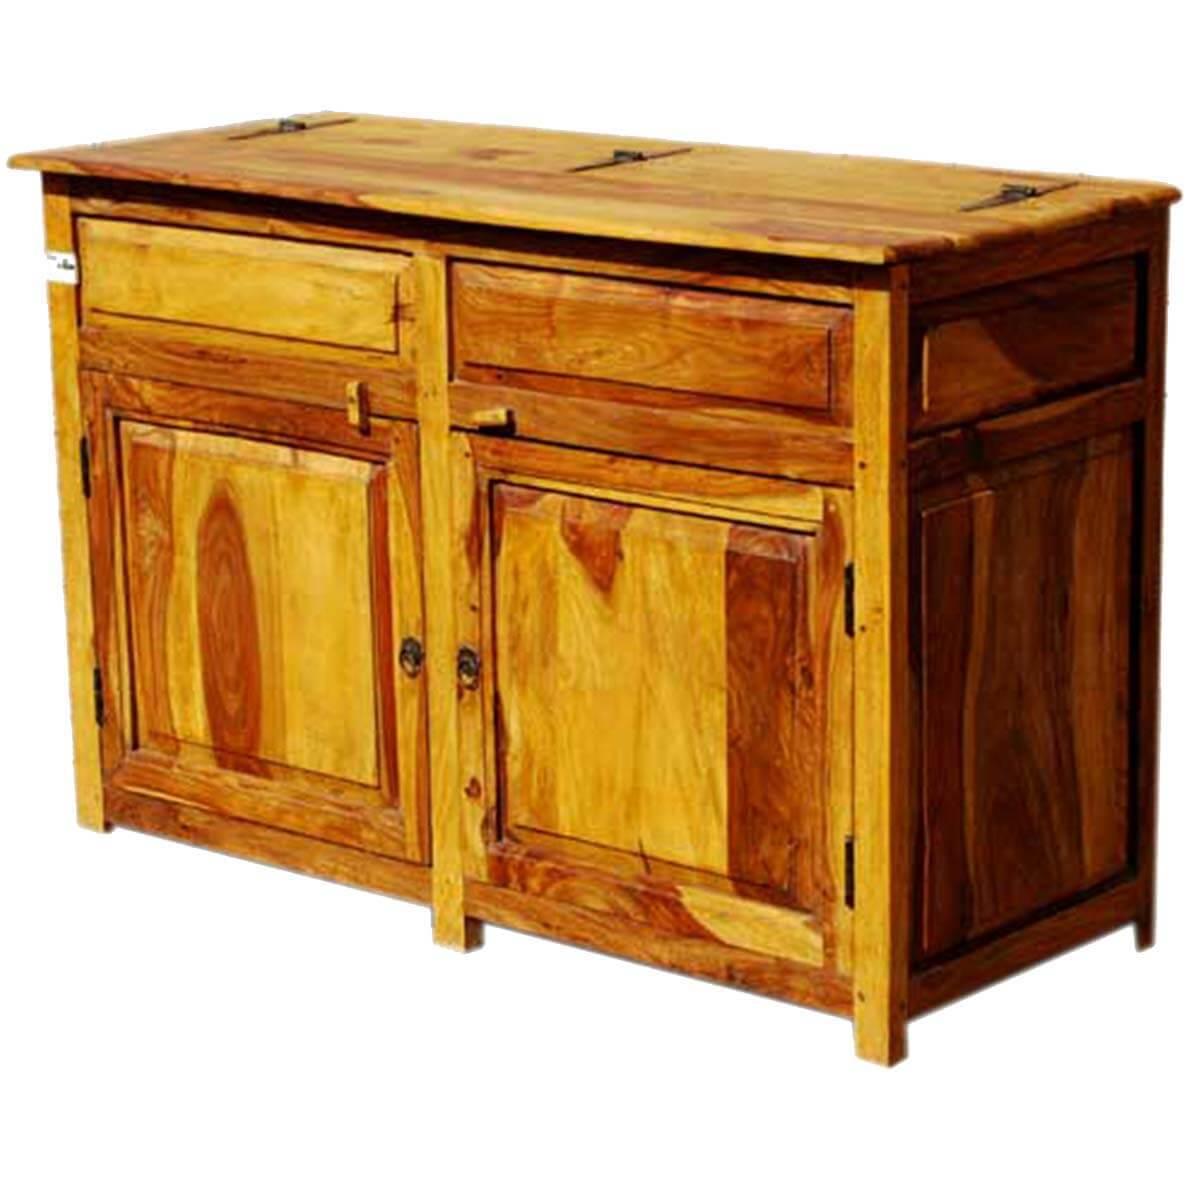 Kitchen Storage Cabinet: Dallas Ranch Rustic Solid Wood 2 Door Kitchen Storage Cabinet